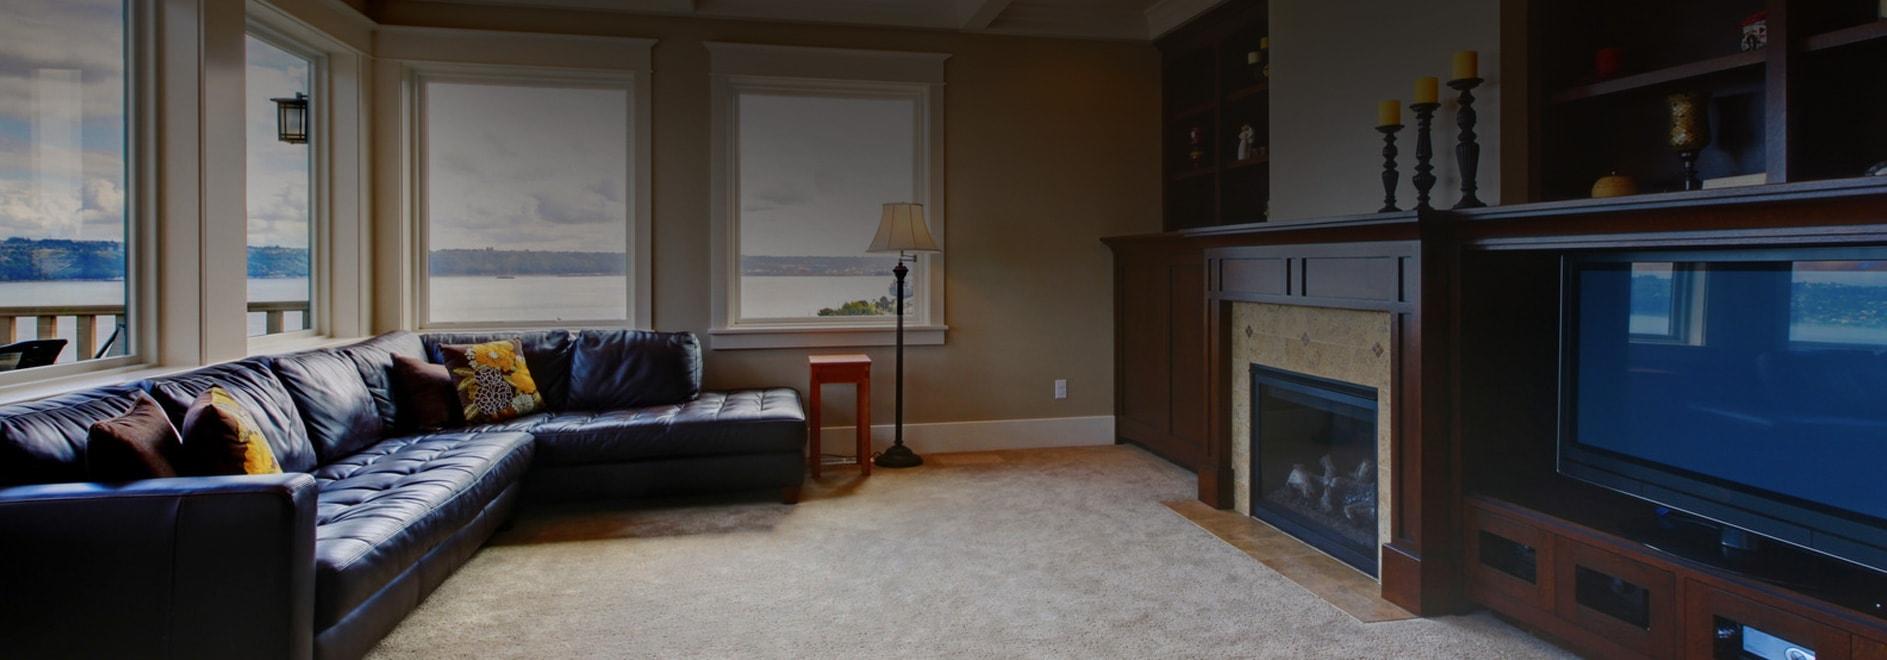 Real Estate Website Design Hampton Roads VA